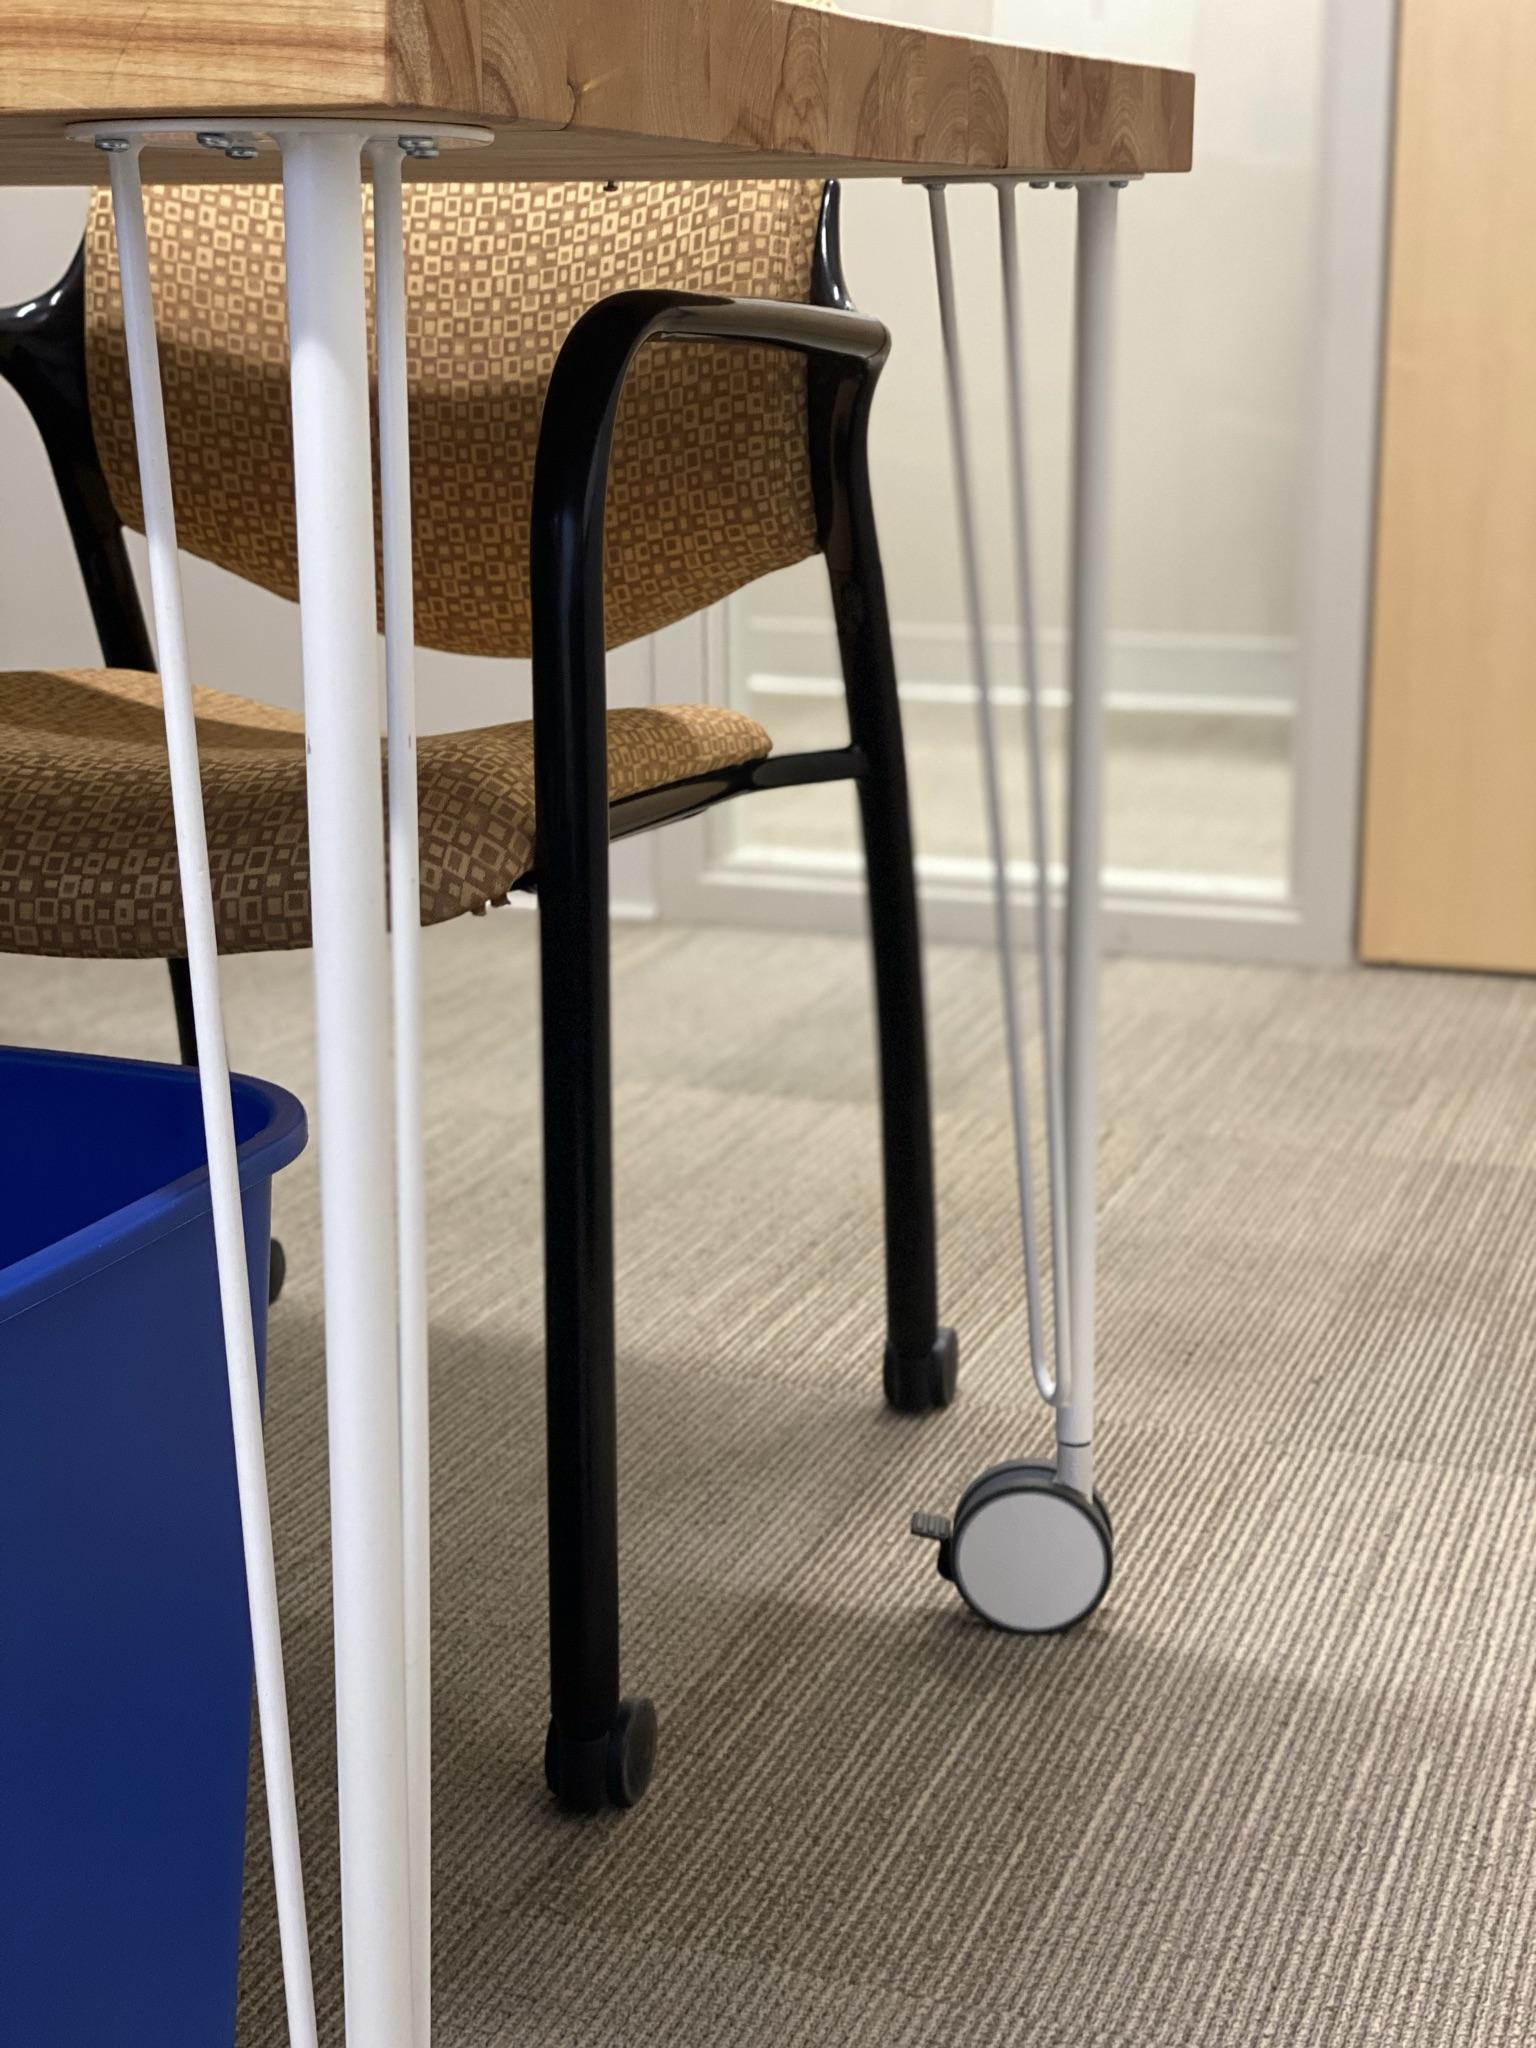 Agile Workspace - Office Furniture On Wheels